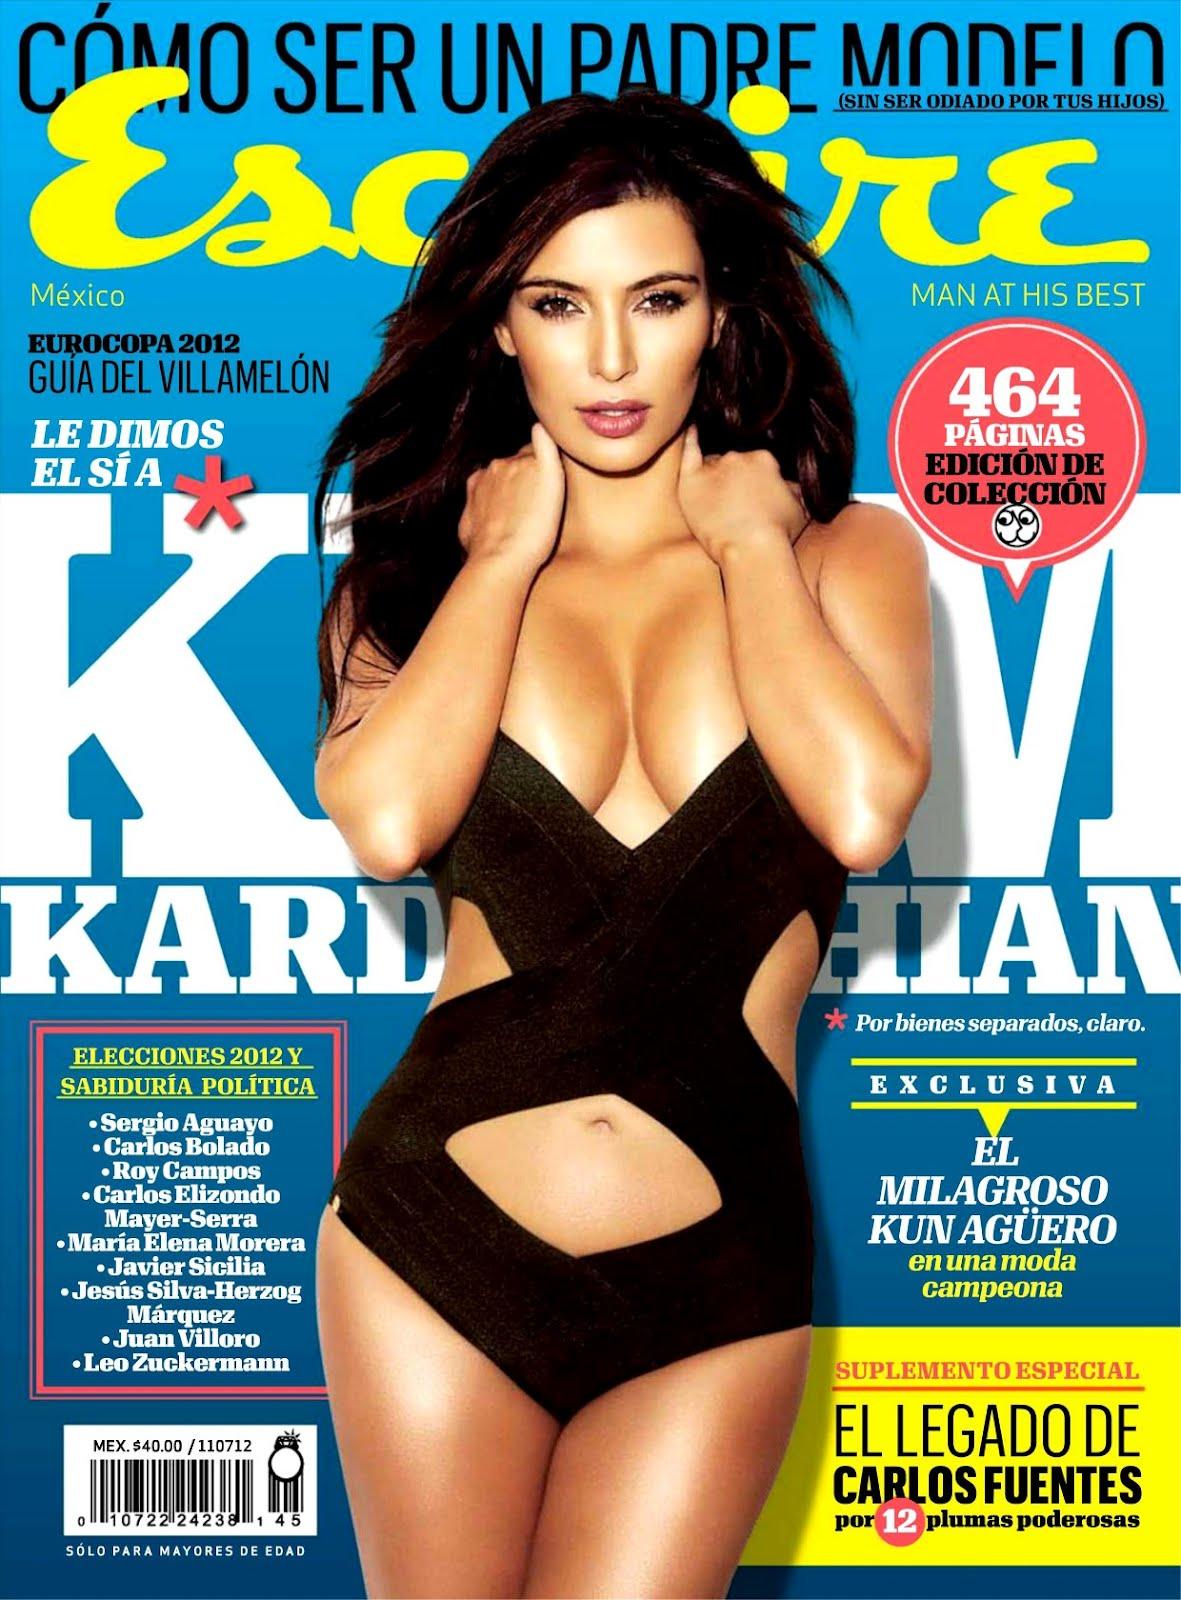 http://1.bp.blogspot.com/-y5v3CJSXpjQ/T99wjEuv2aI/AAAAAAAAHOg/-mAgAO1XI2o/s1600/Kim-Kardashian-12.jpg